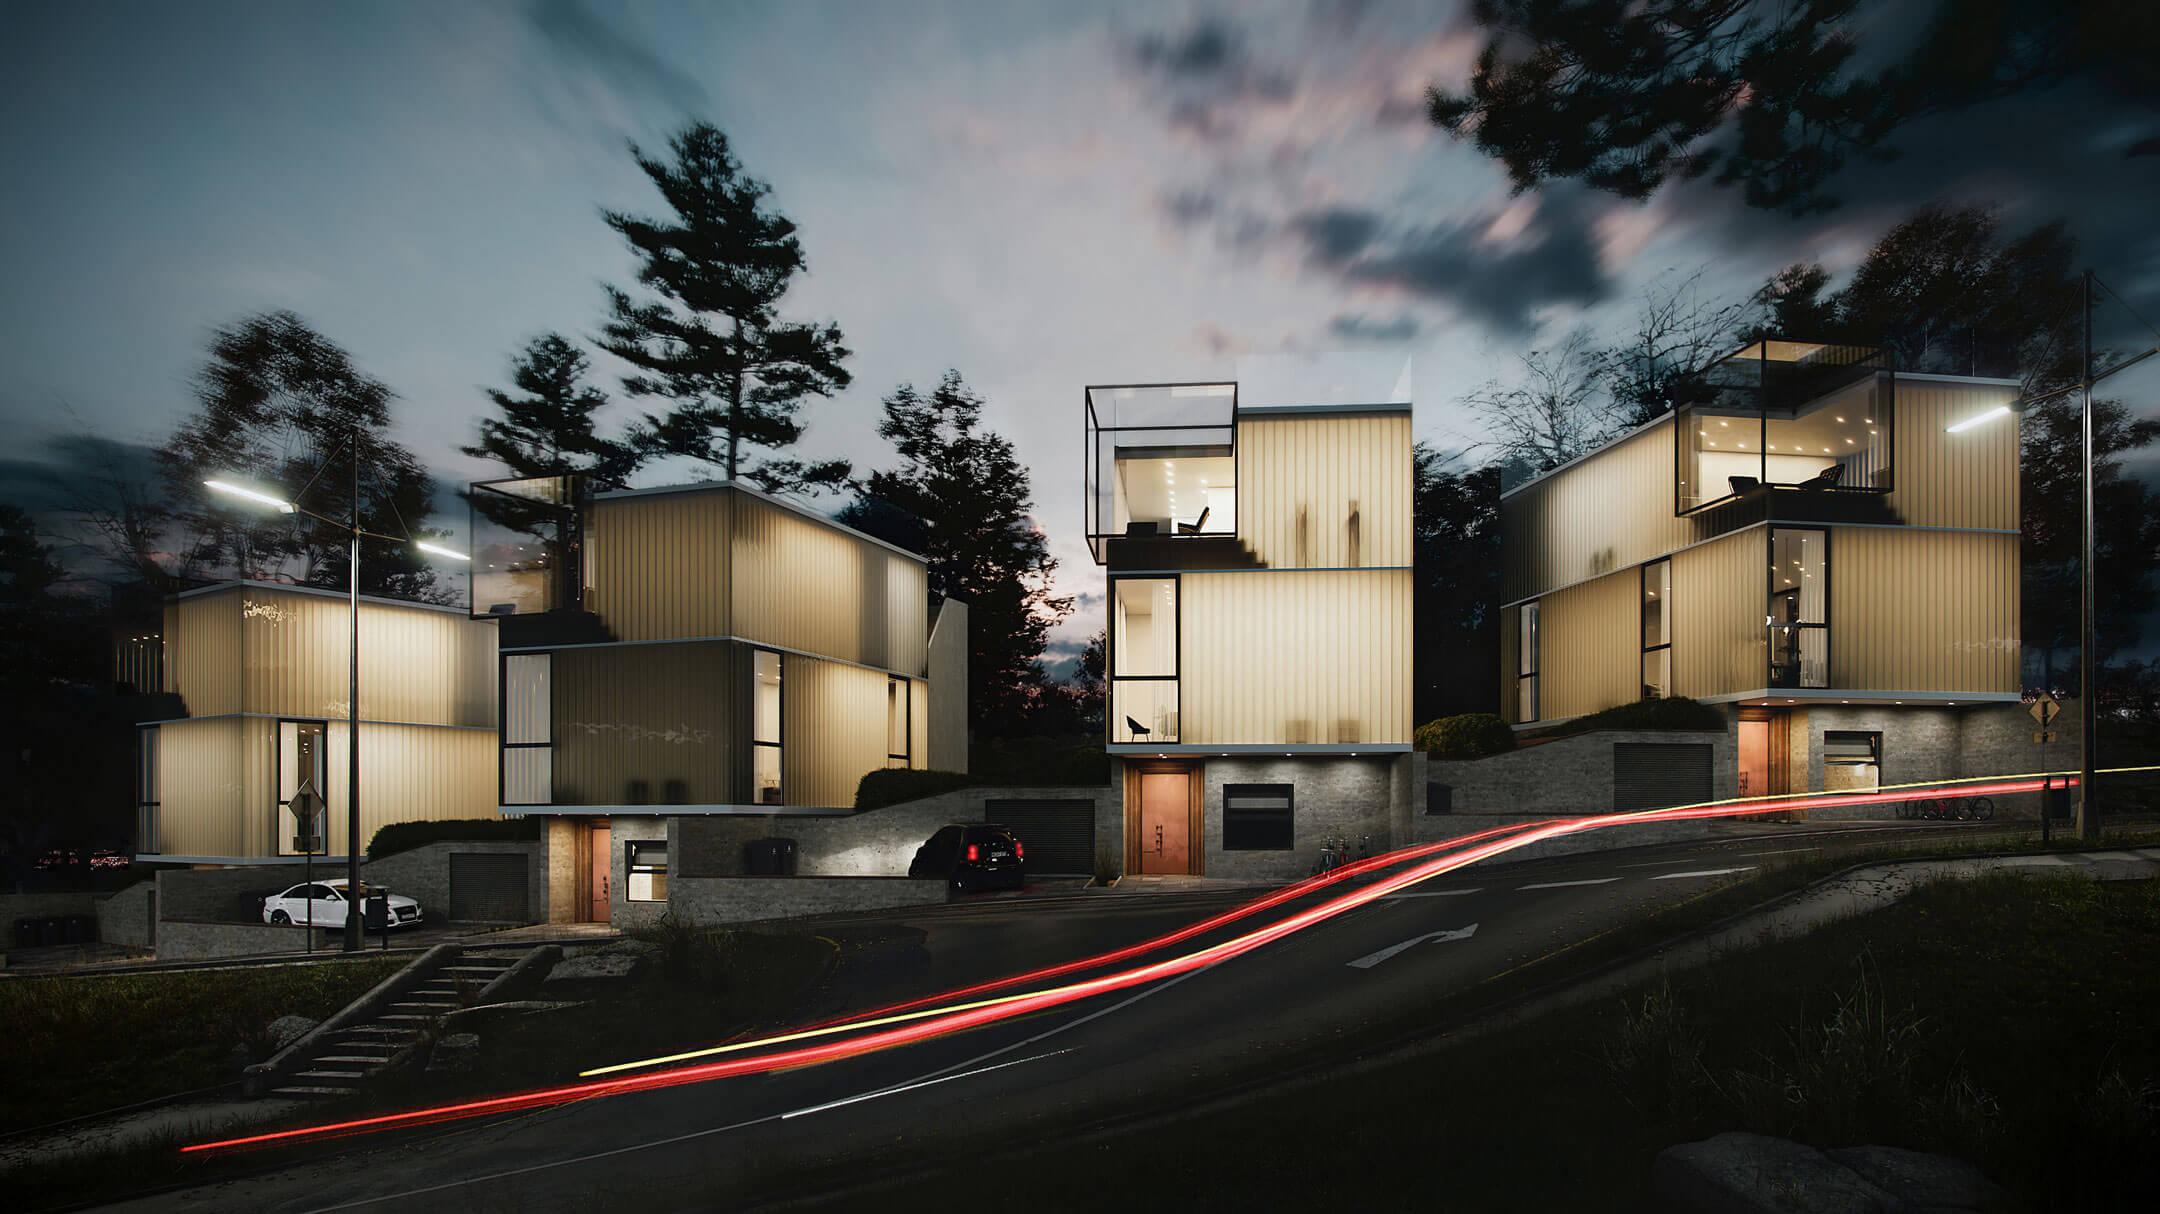 CG Exterior Render Showing Modern Cottages at Evening